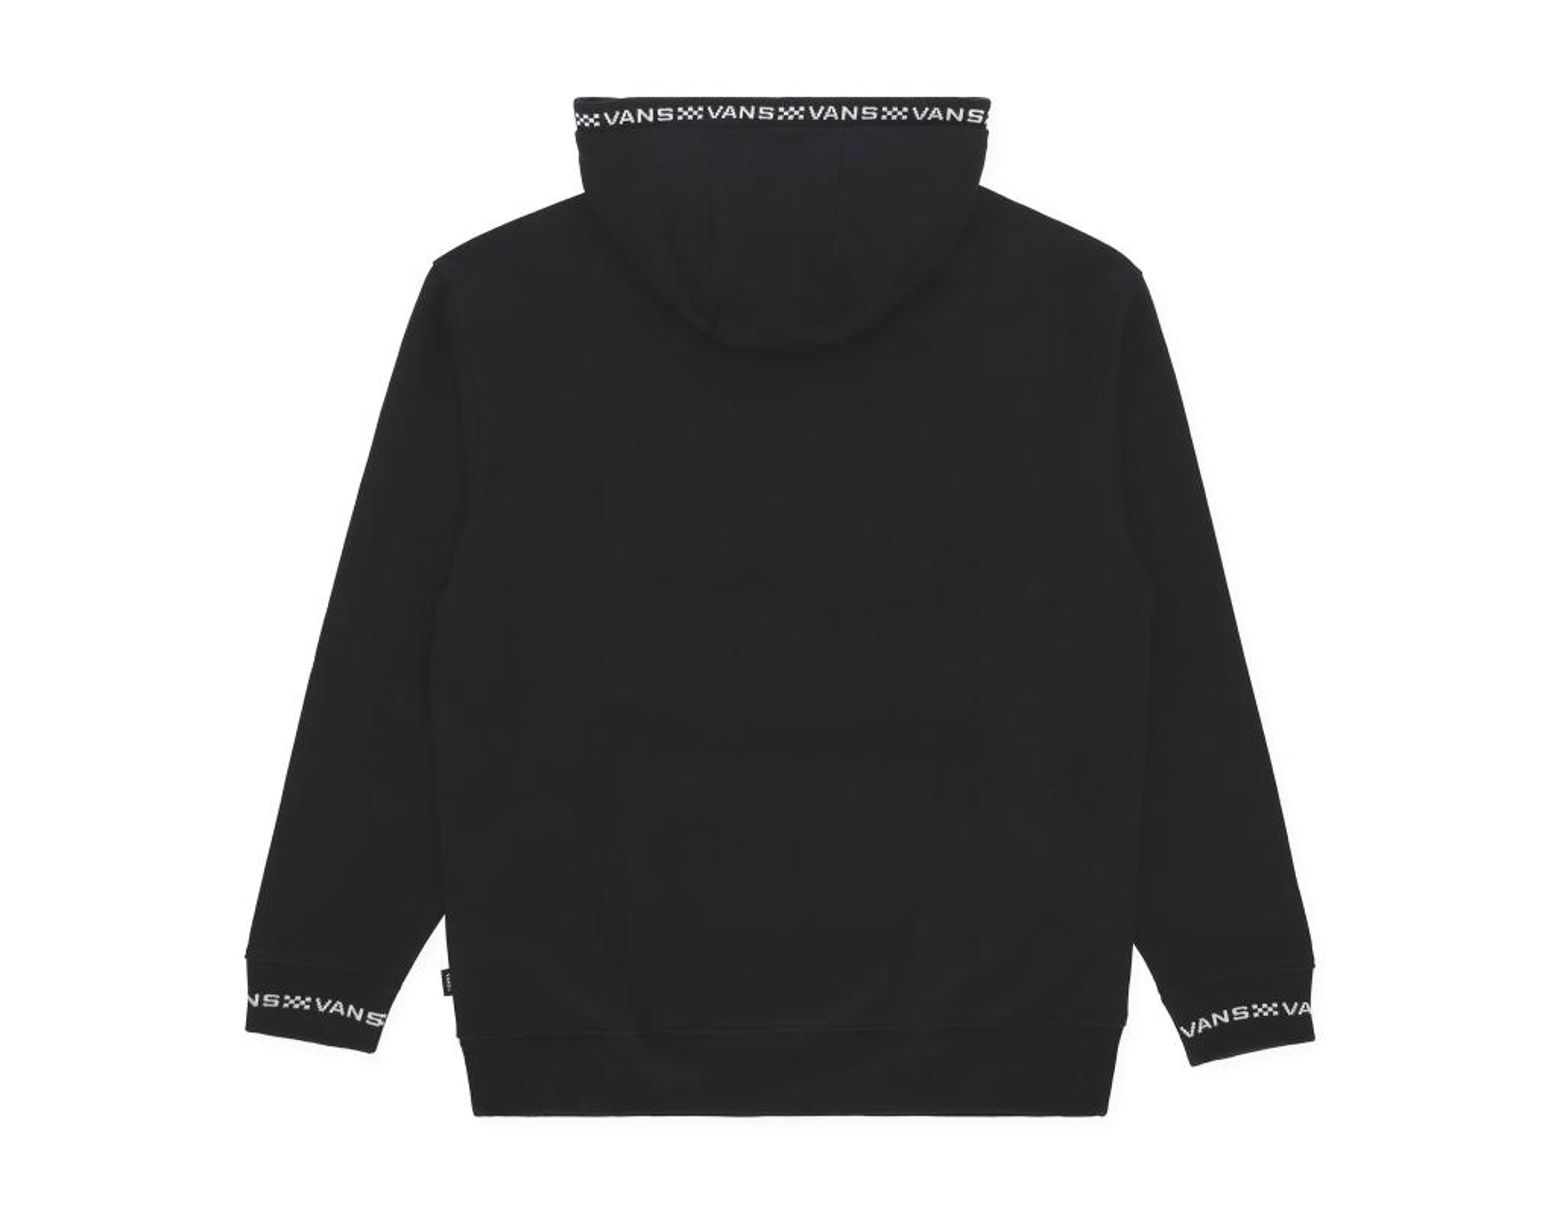 5a49852849 Vans Circle V Hooded Sweatshirt in Black for Men - Lyst